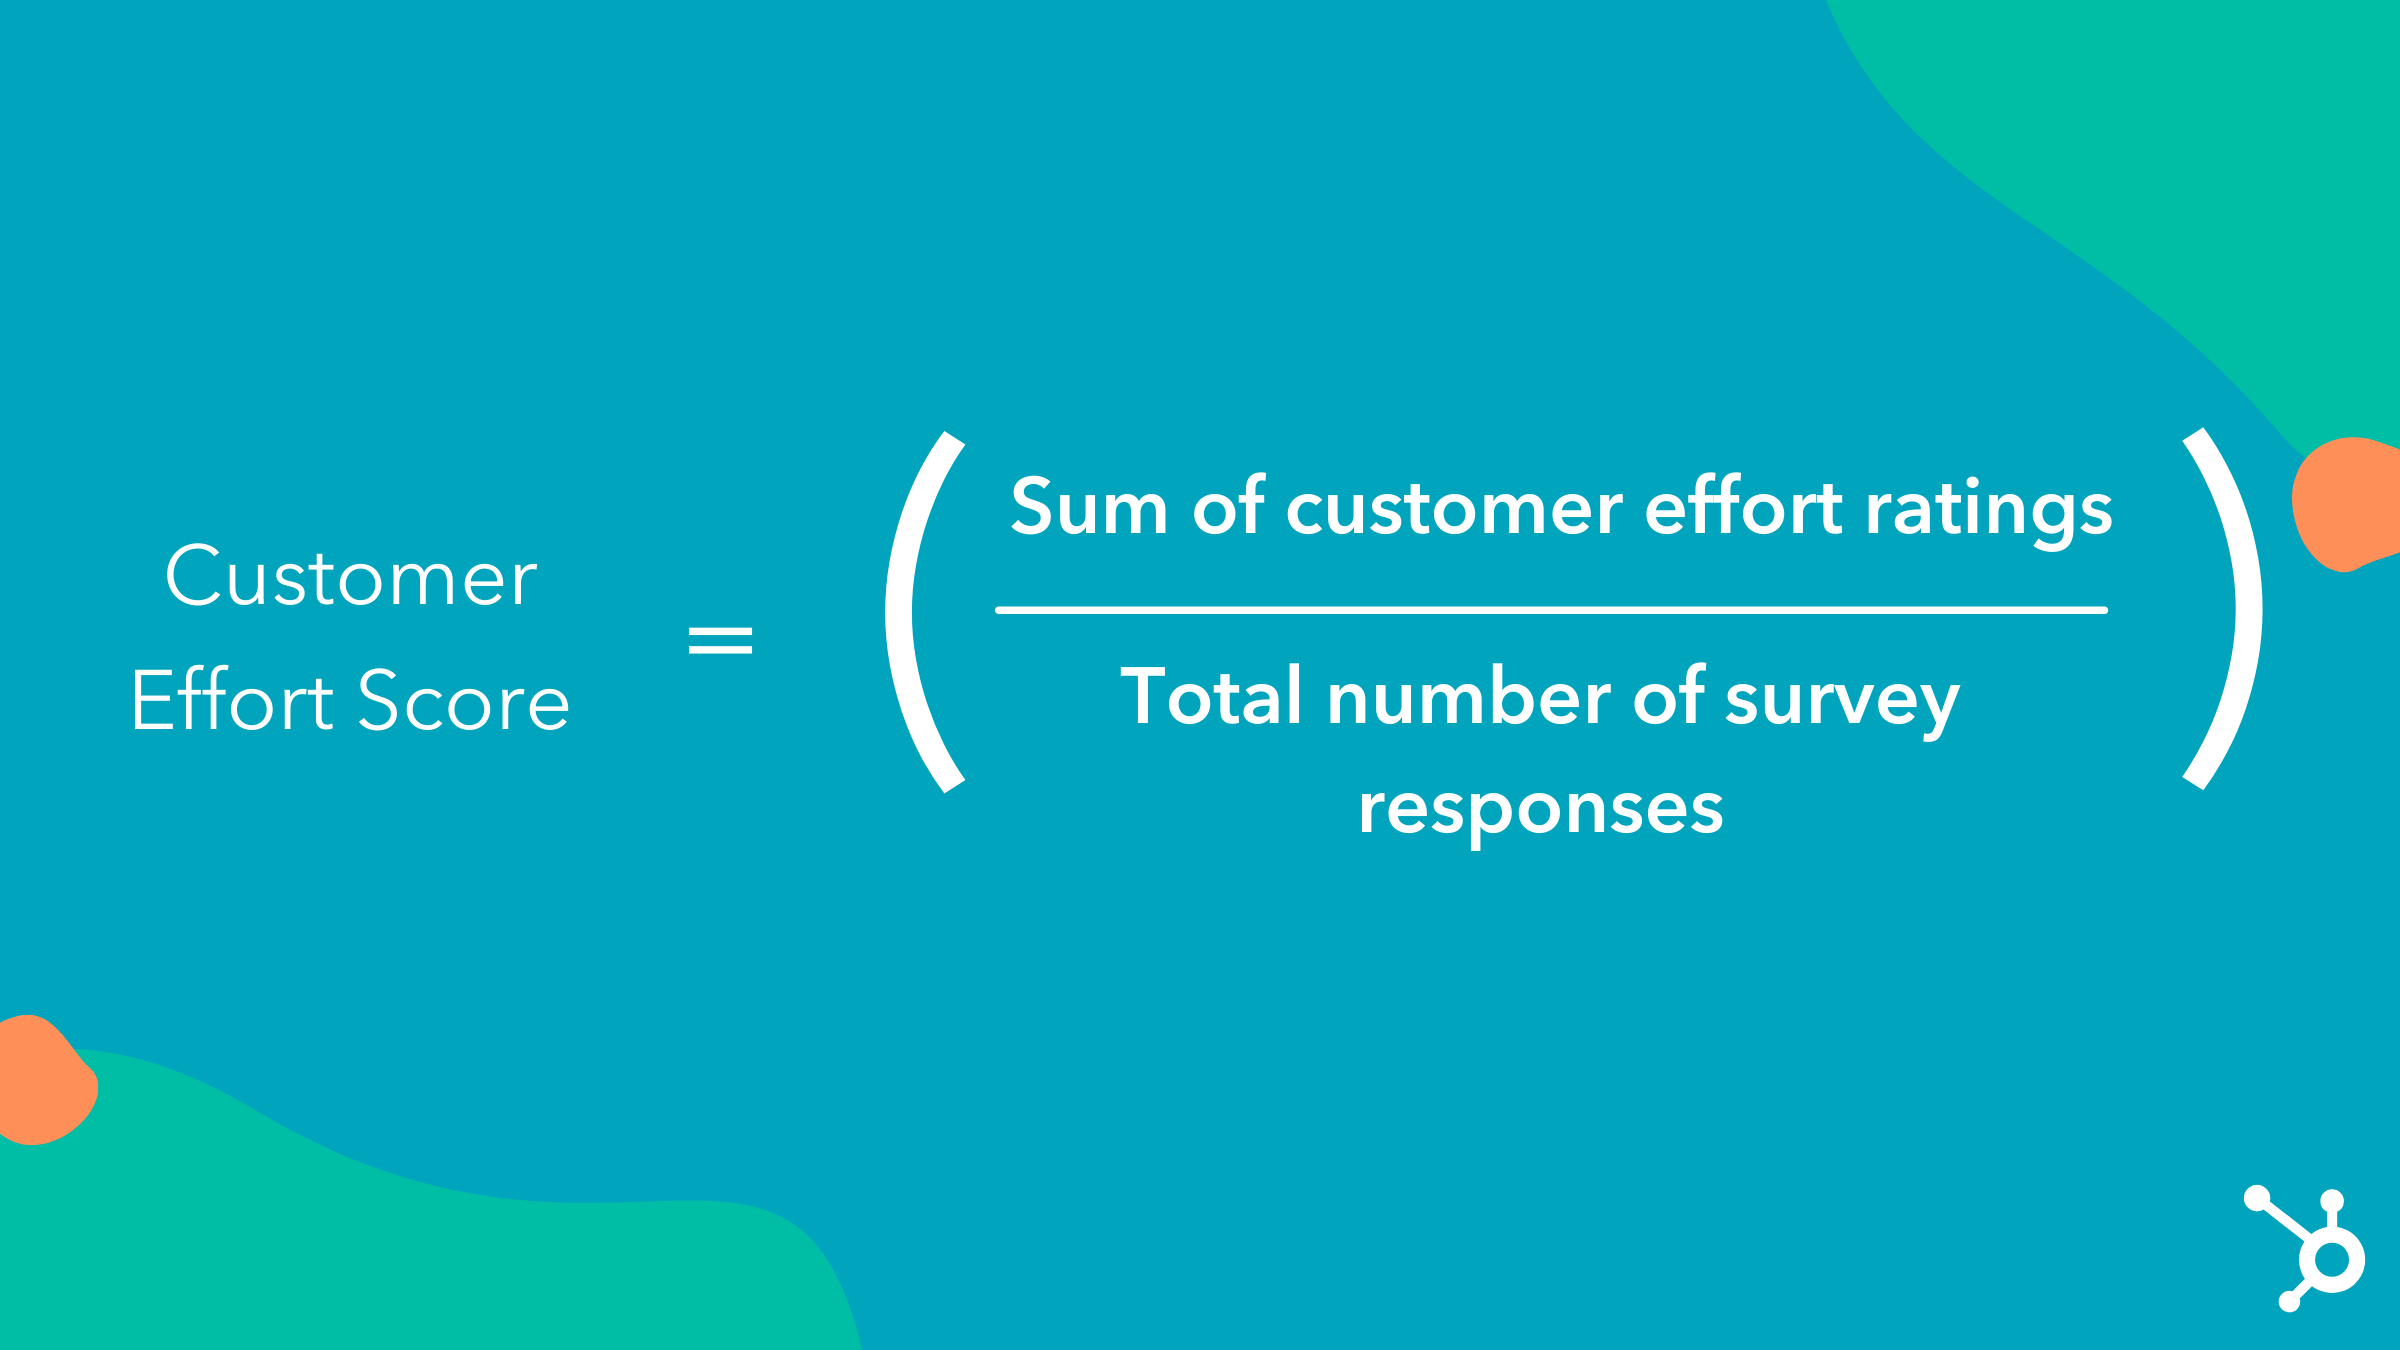 graphic displaying the customer effort score calculation formula